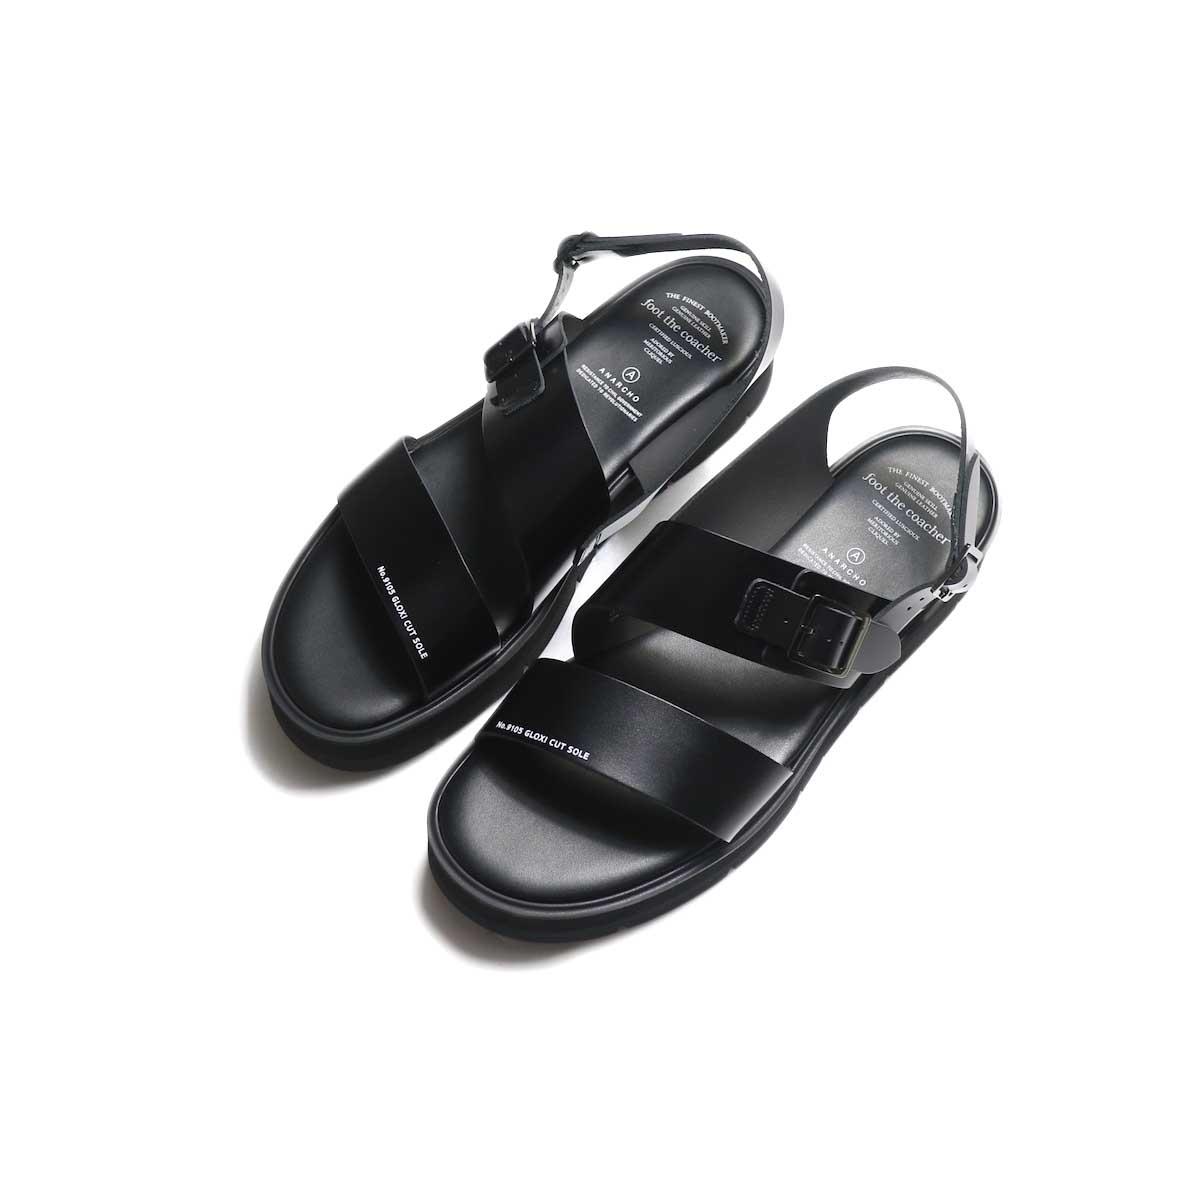 foot the coacher / SS BELT SANDALS (GLOXI CUT SOLE) -Black